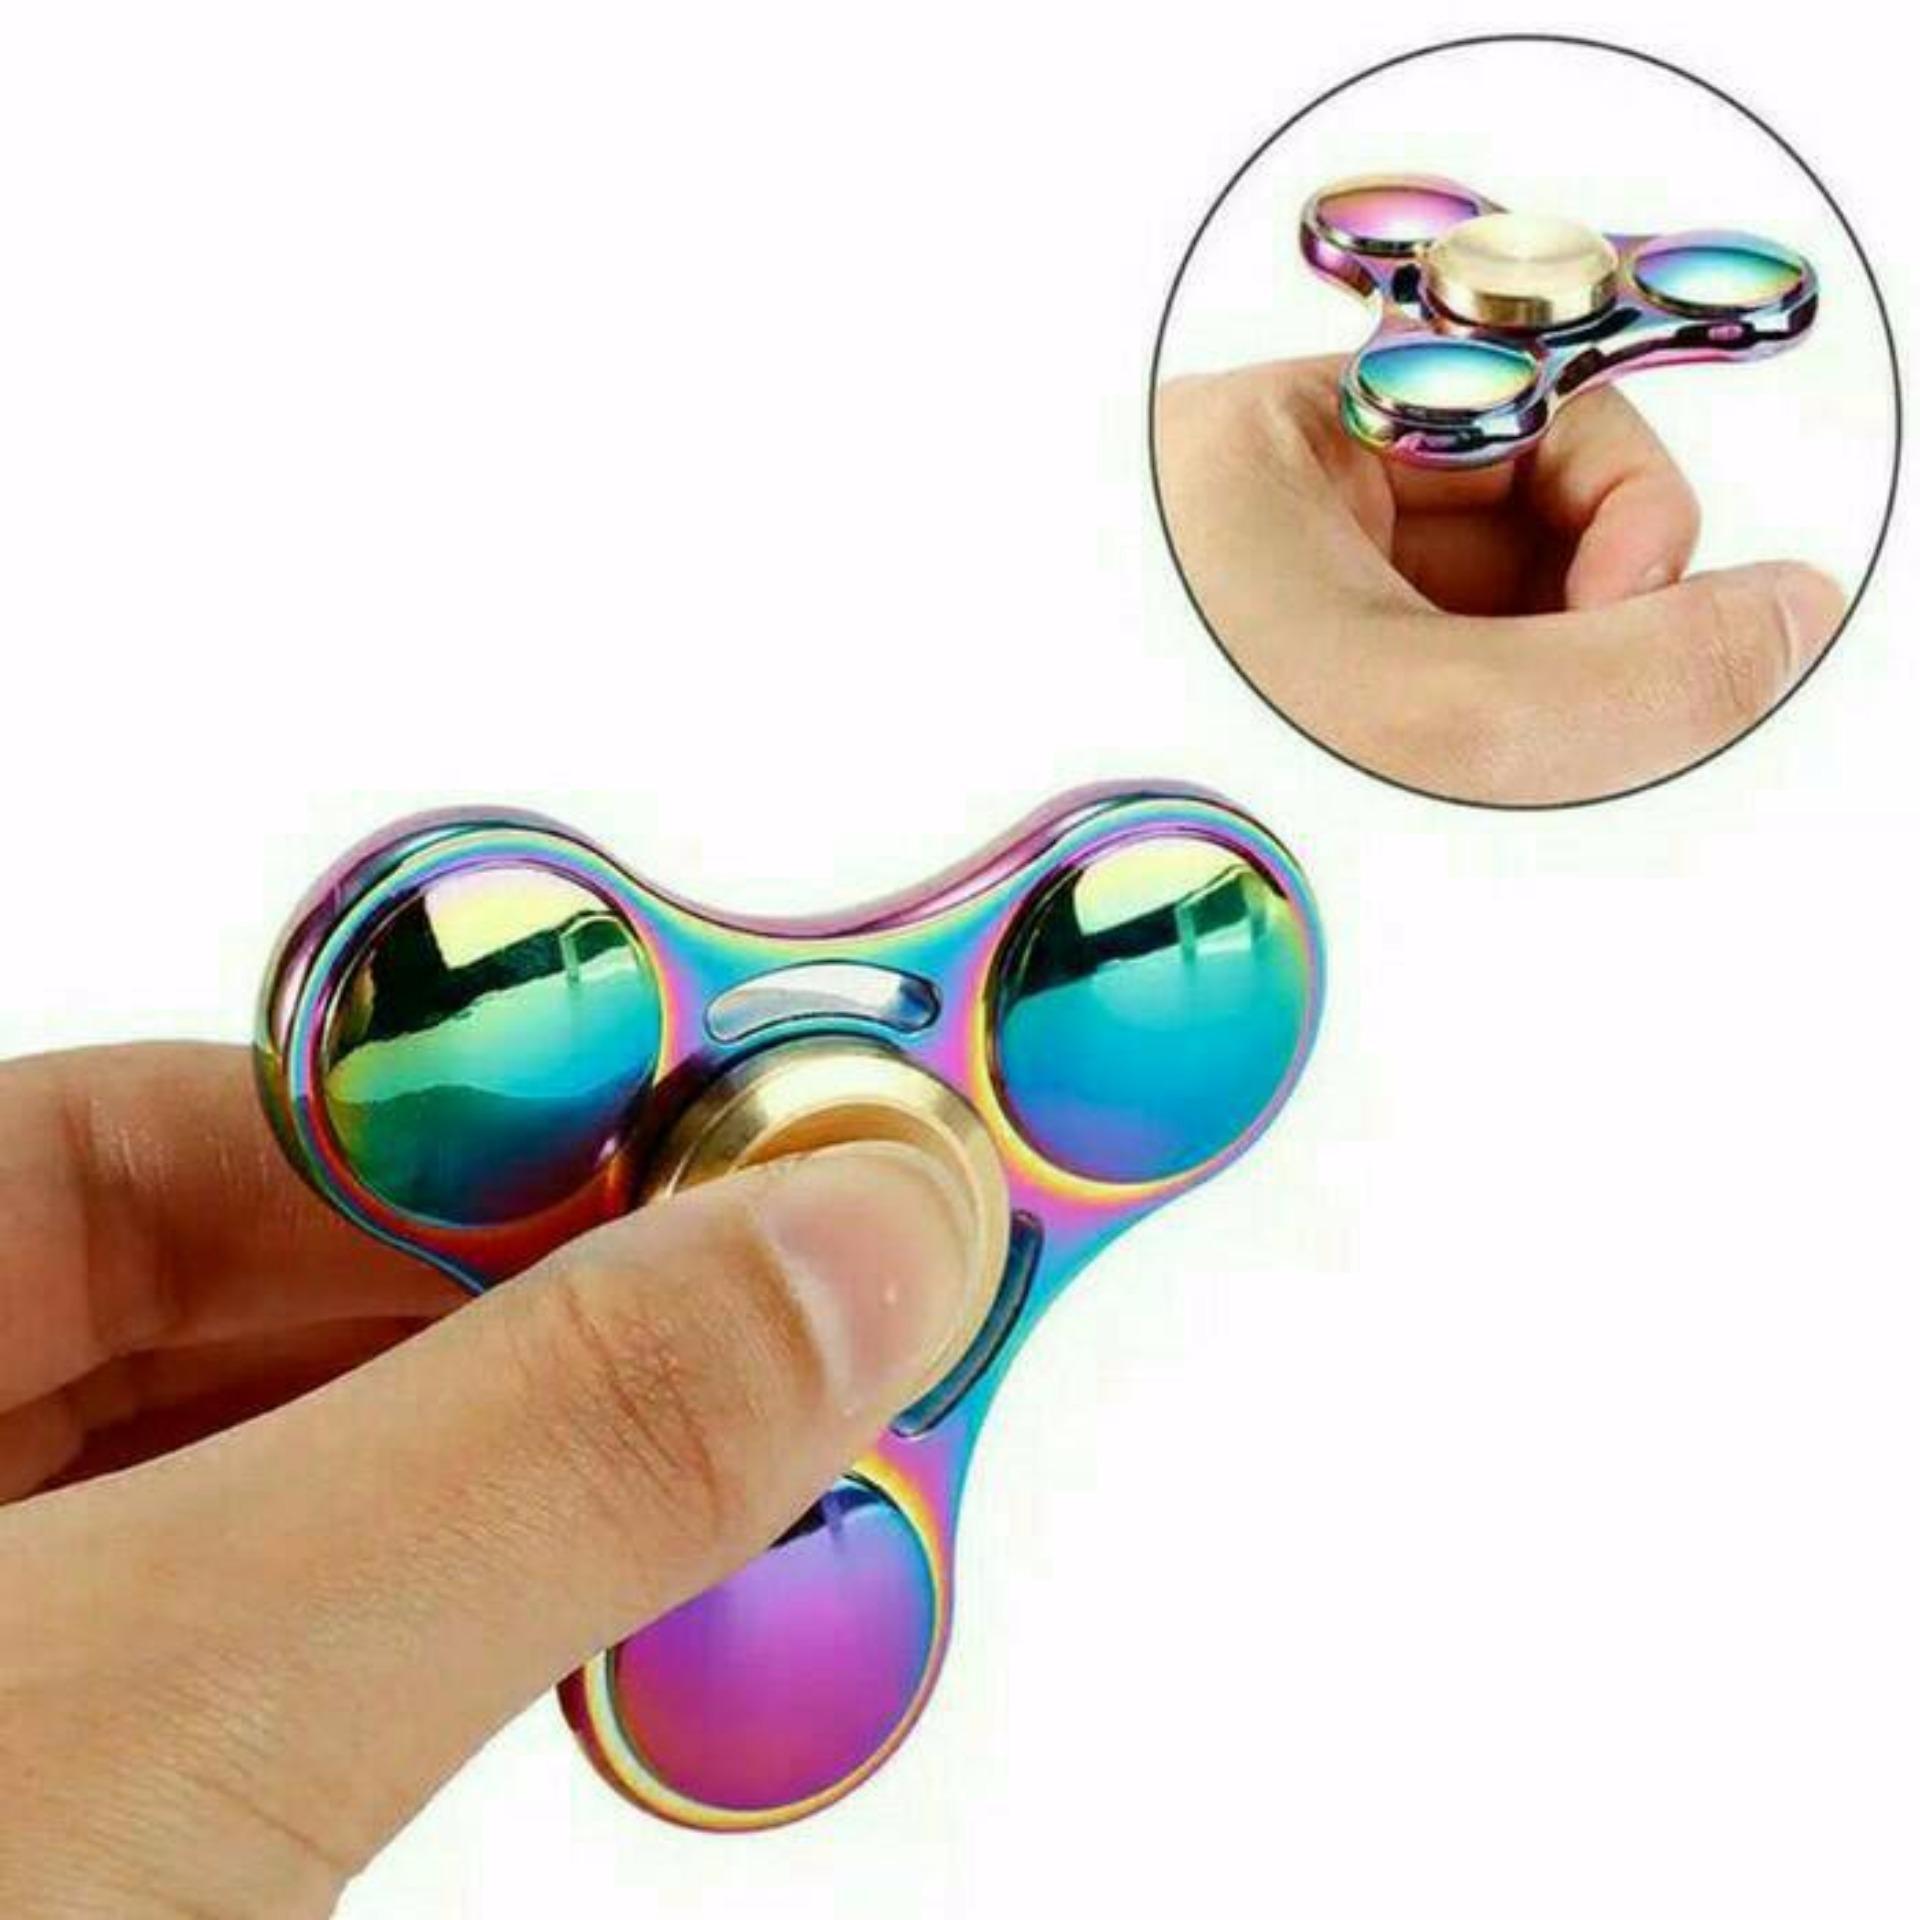 Toys Focus Games Mainan Spinner Source Happy Fidget Spinner Hand